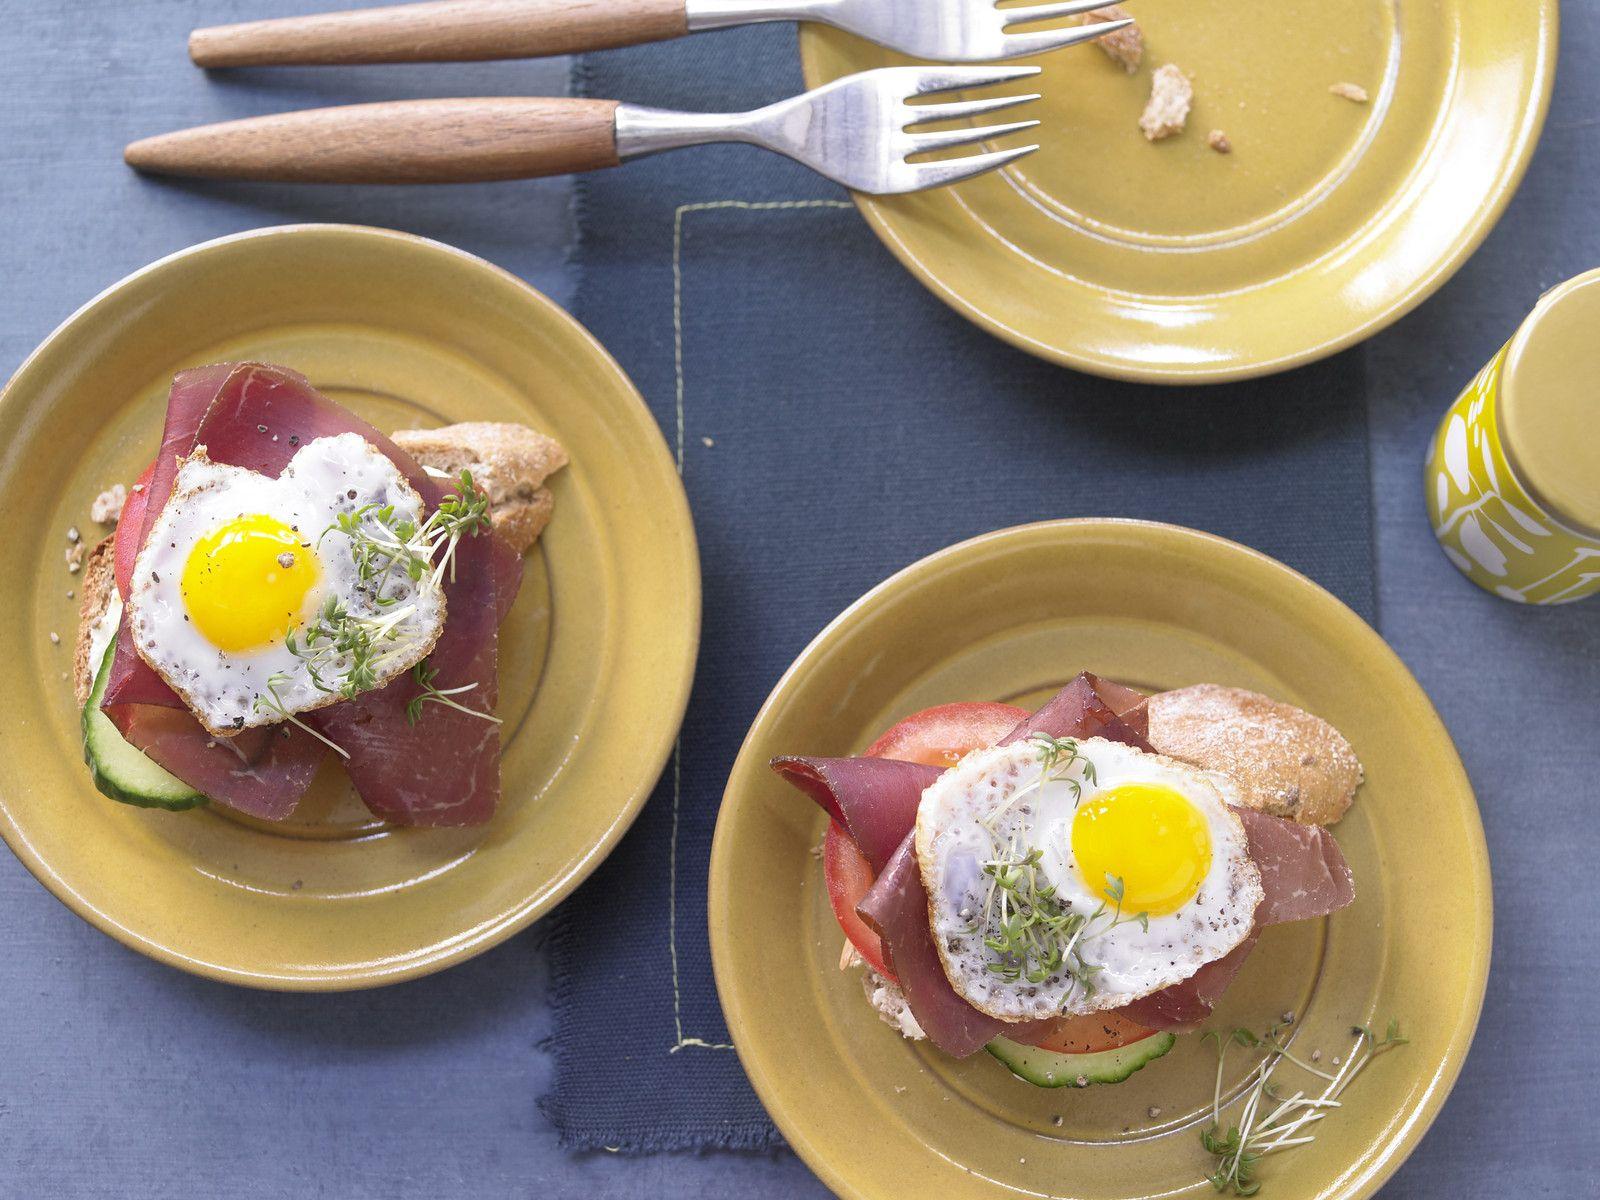 Fleischgerichte unter 400 Kalorien | EAT SMARTER